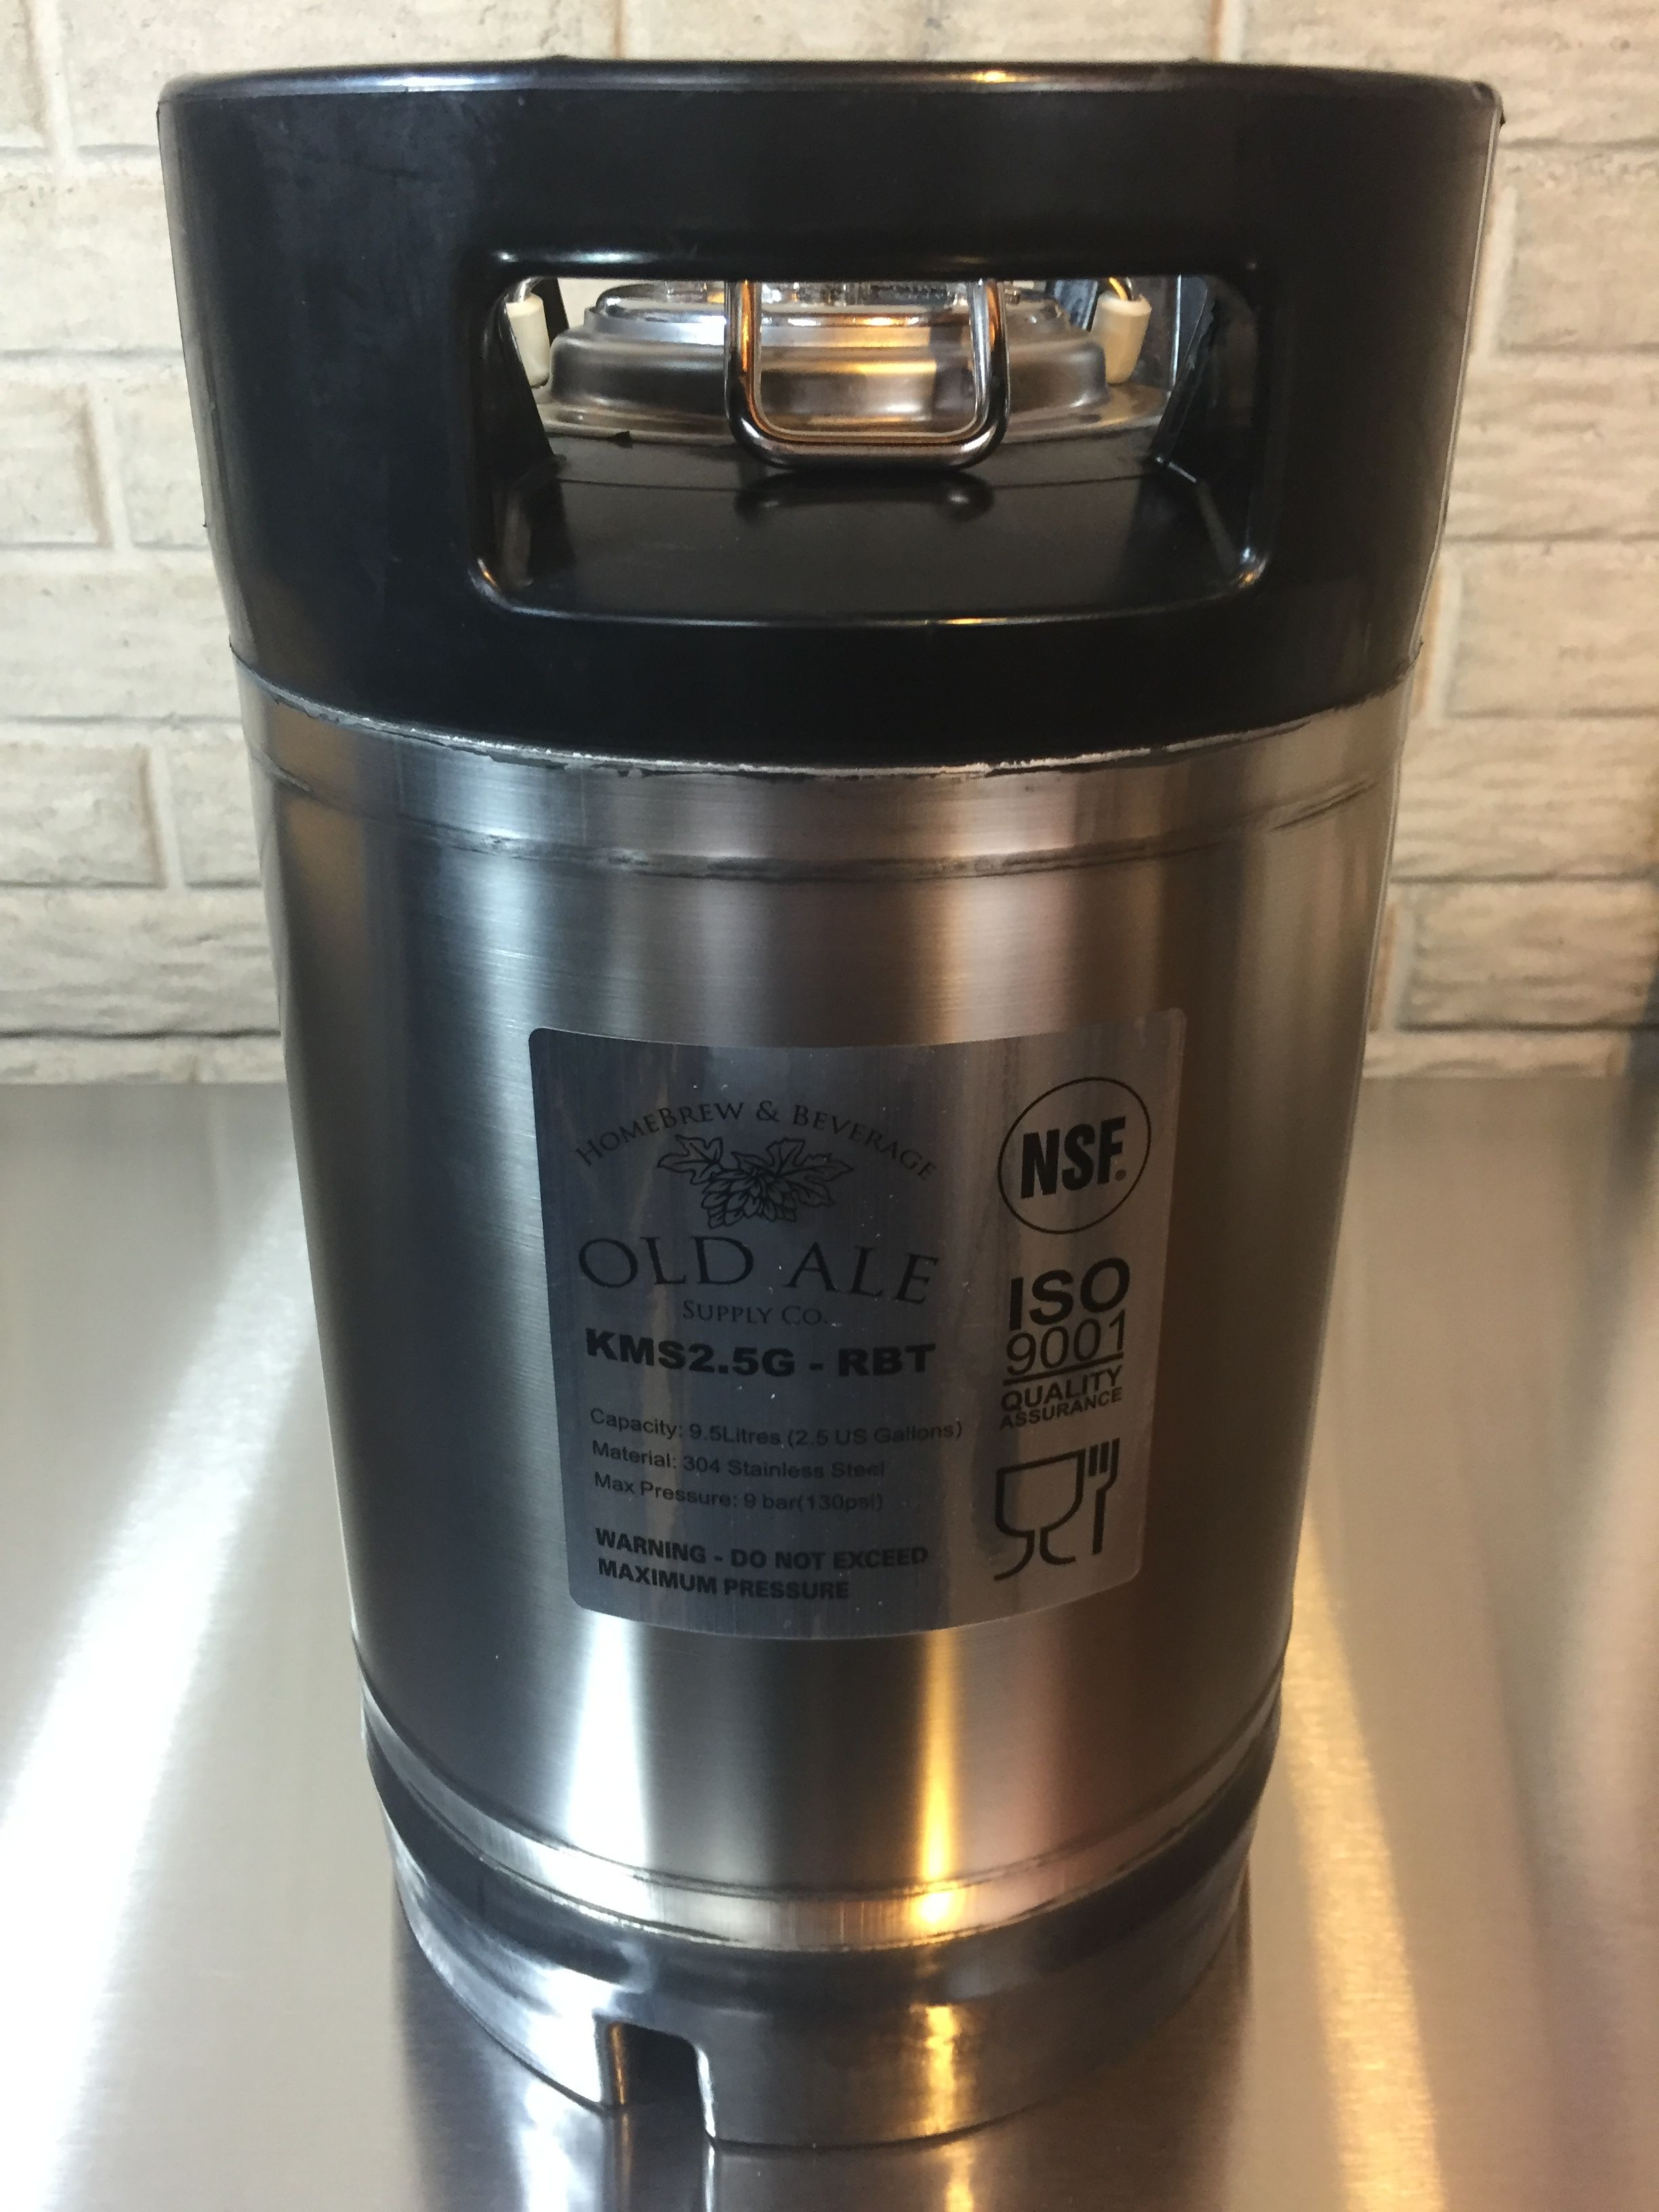 aih 2.5 gallon keg